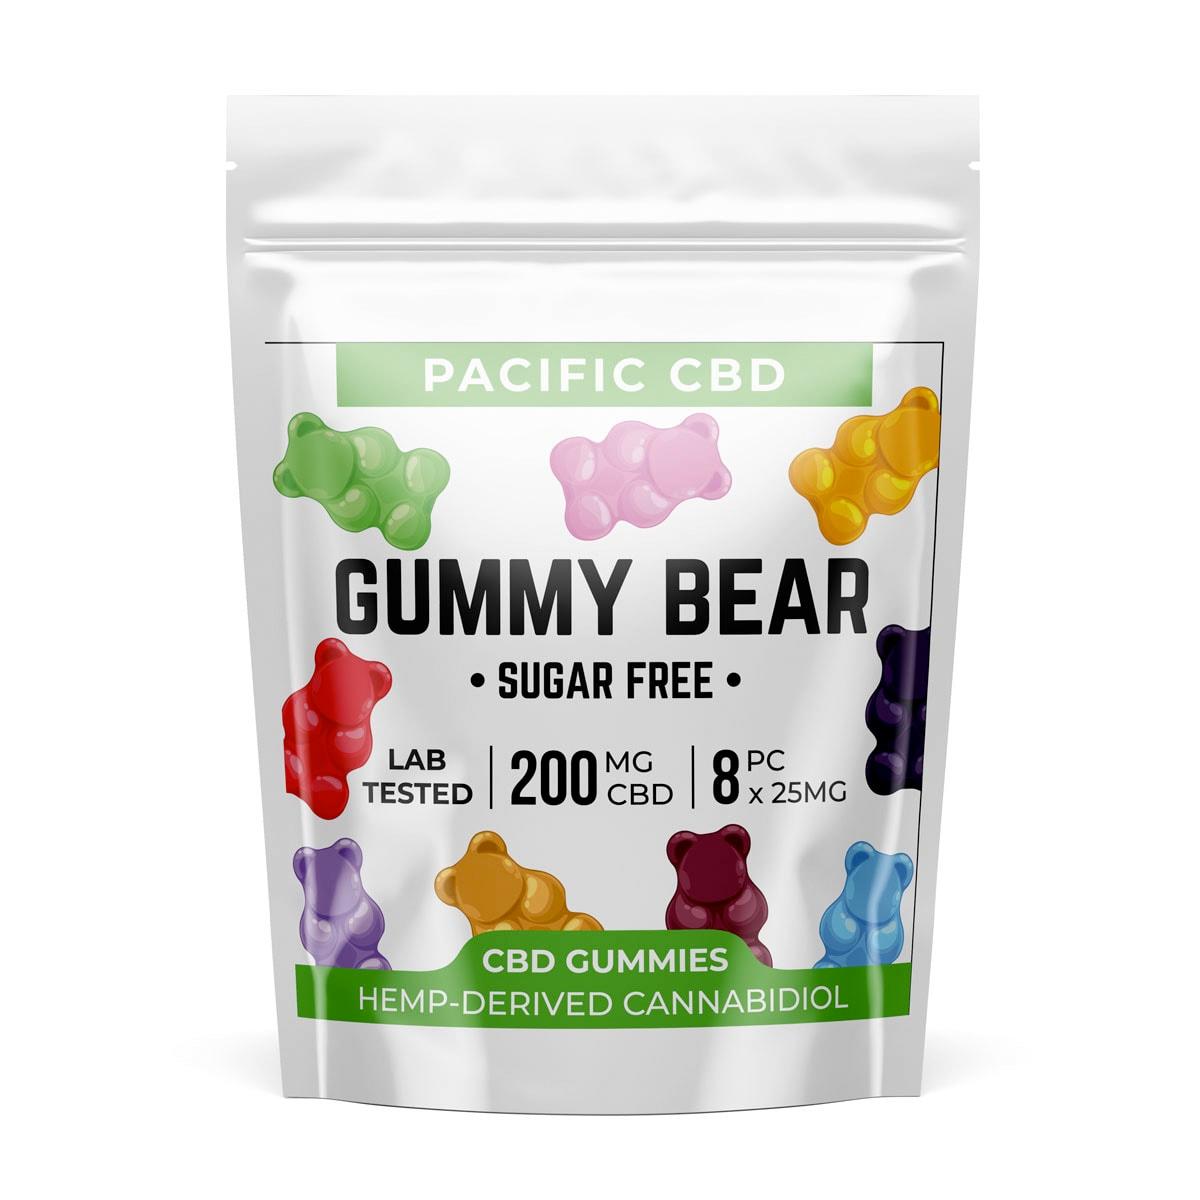 Buy Pacific CBD Sugar Free Gummy Bears 200mg